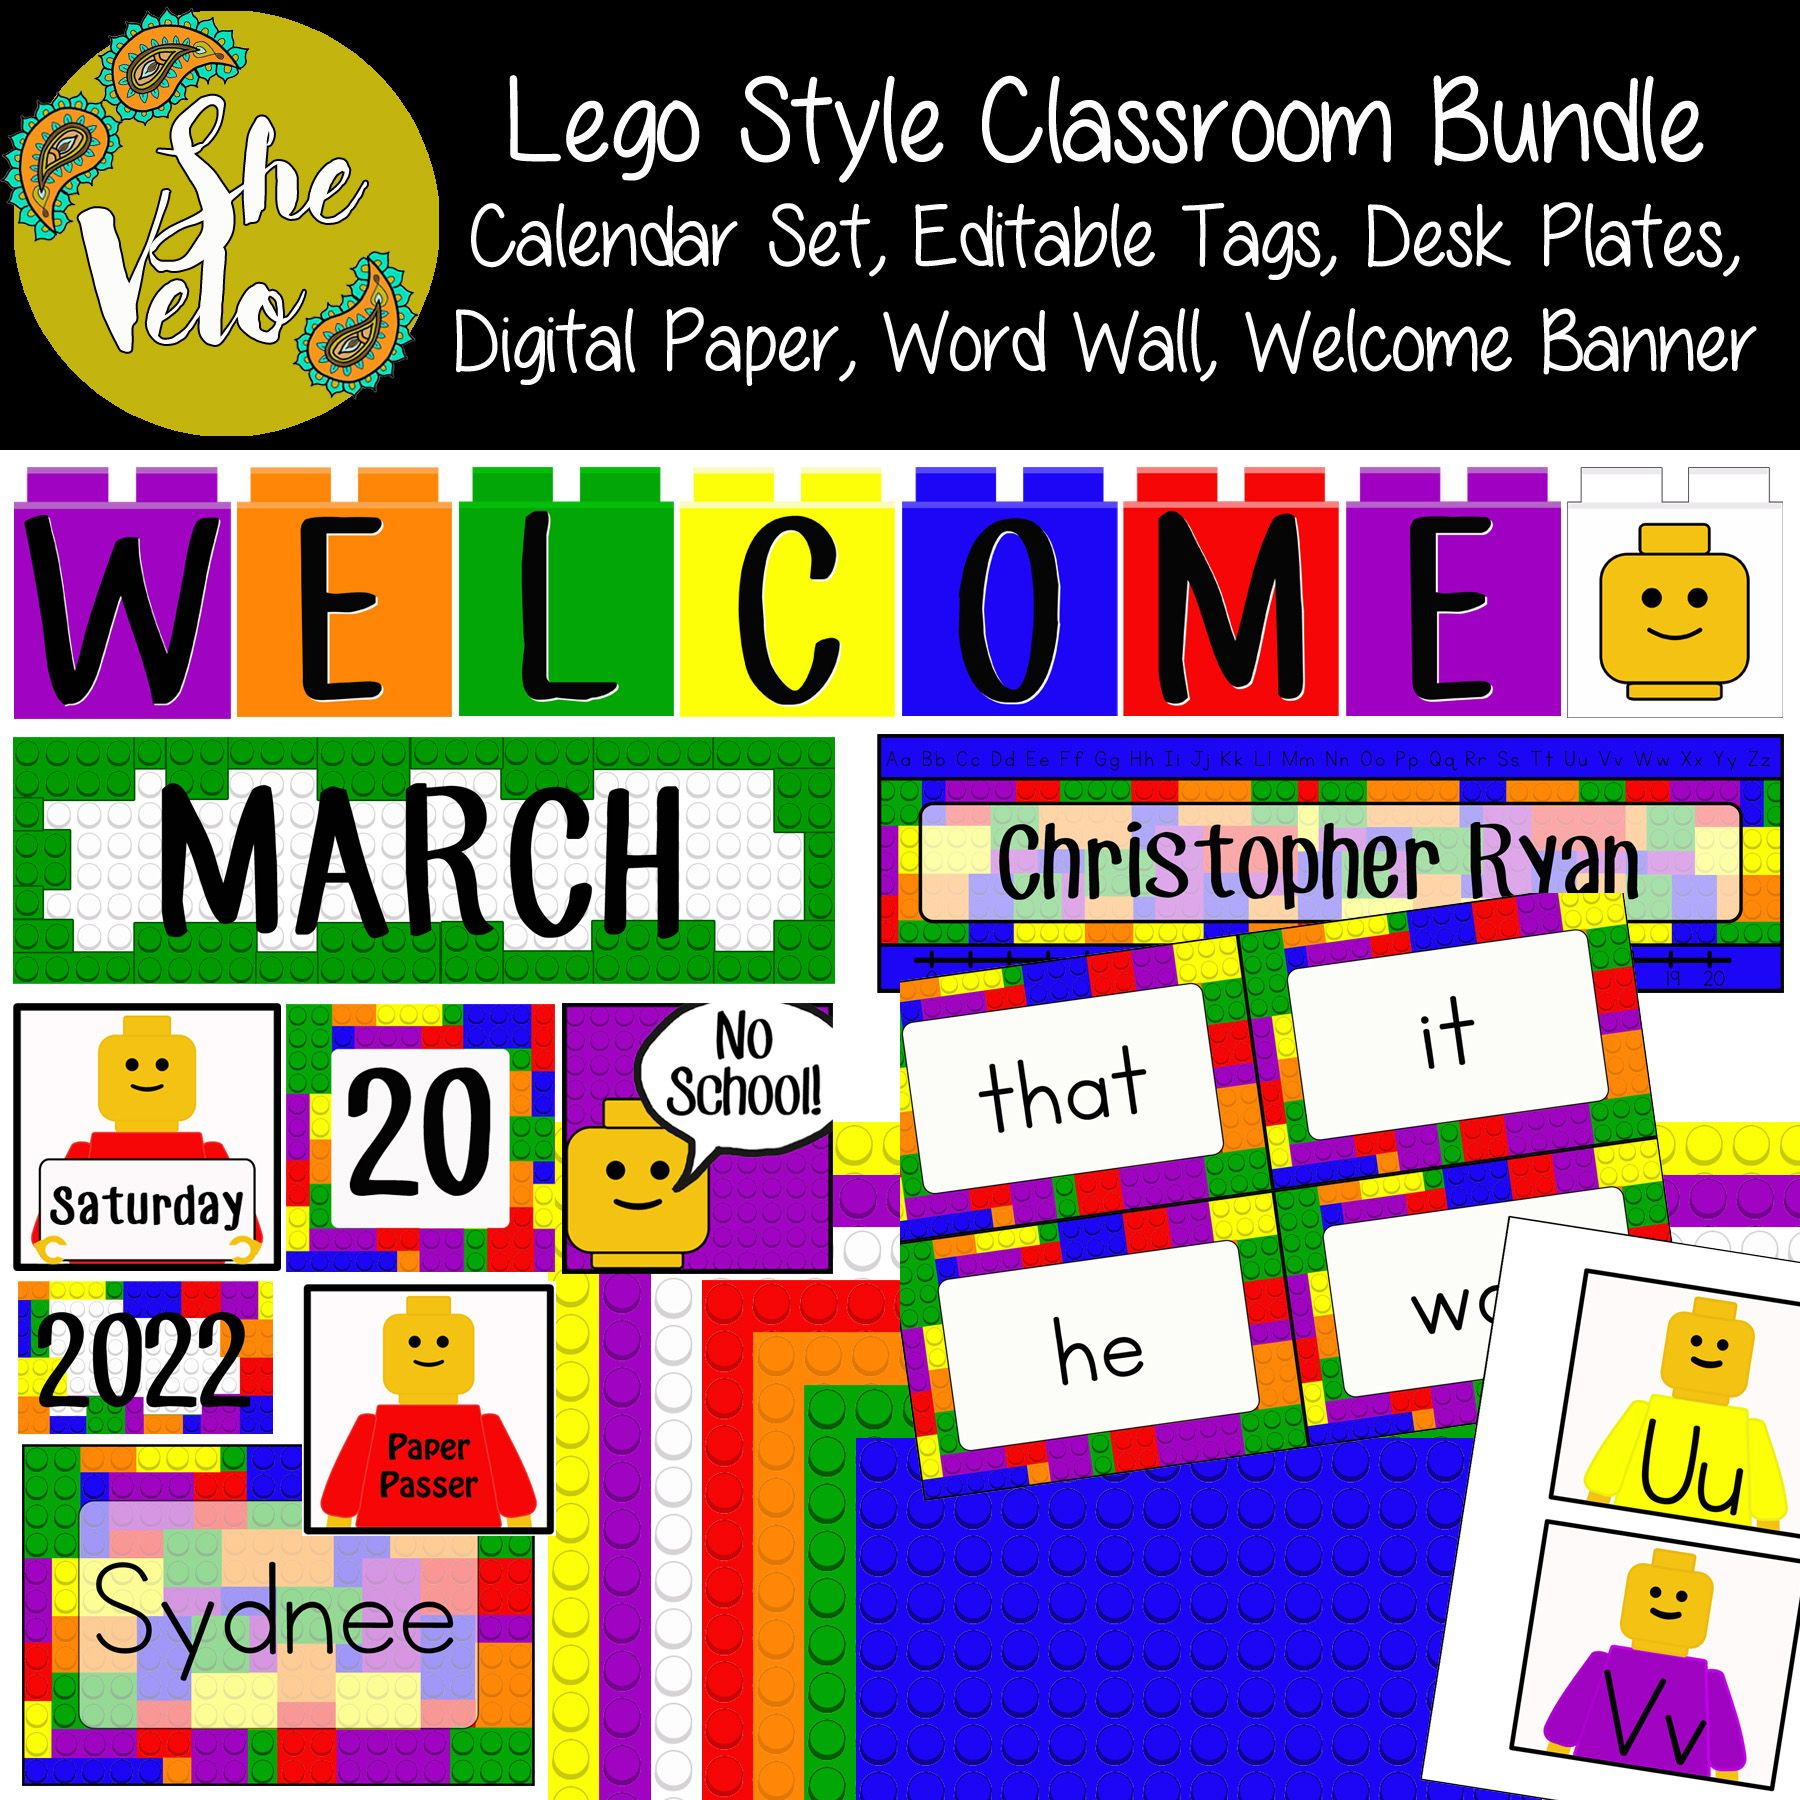 Lego Style Classroom Set Welcome Banner Calendar Editable Tags